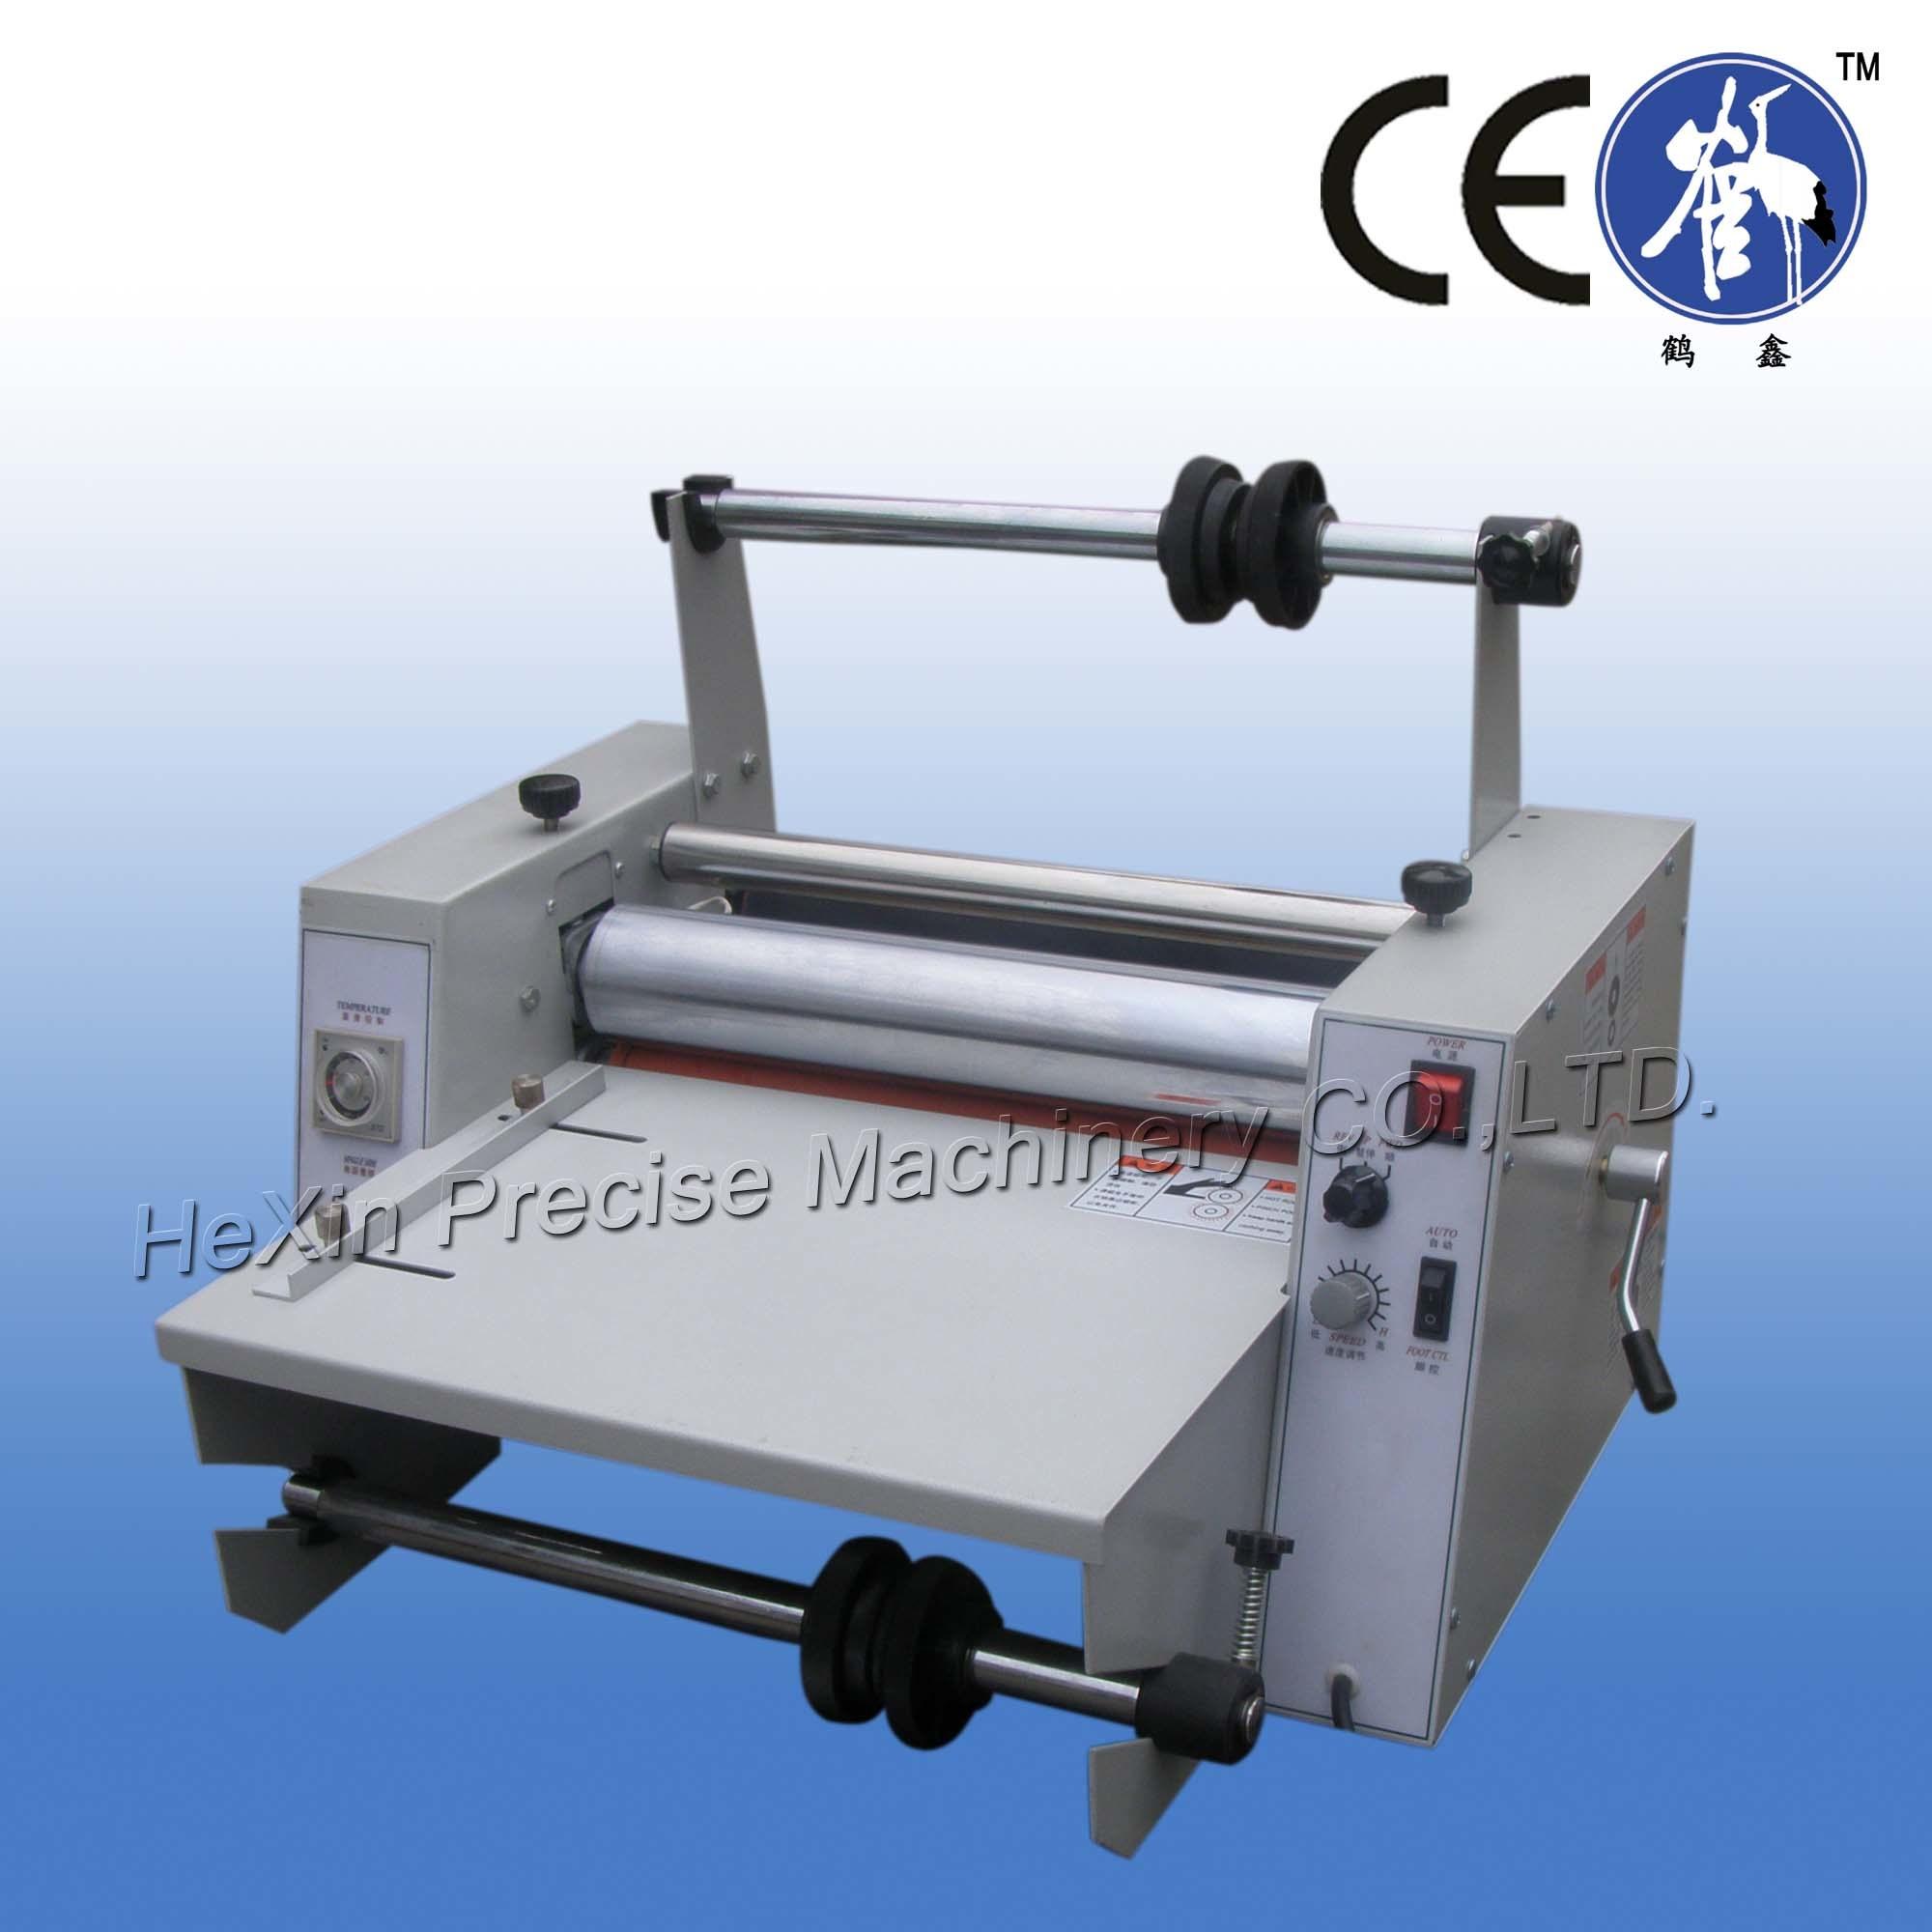 Hx-380f Laminating Machine